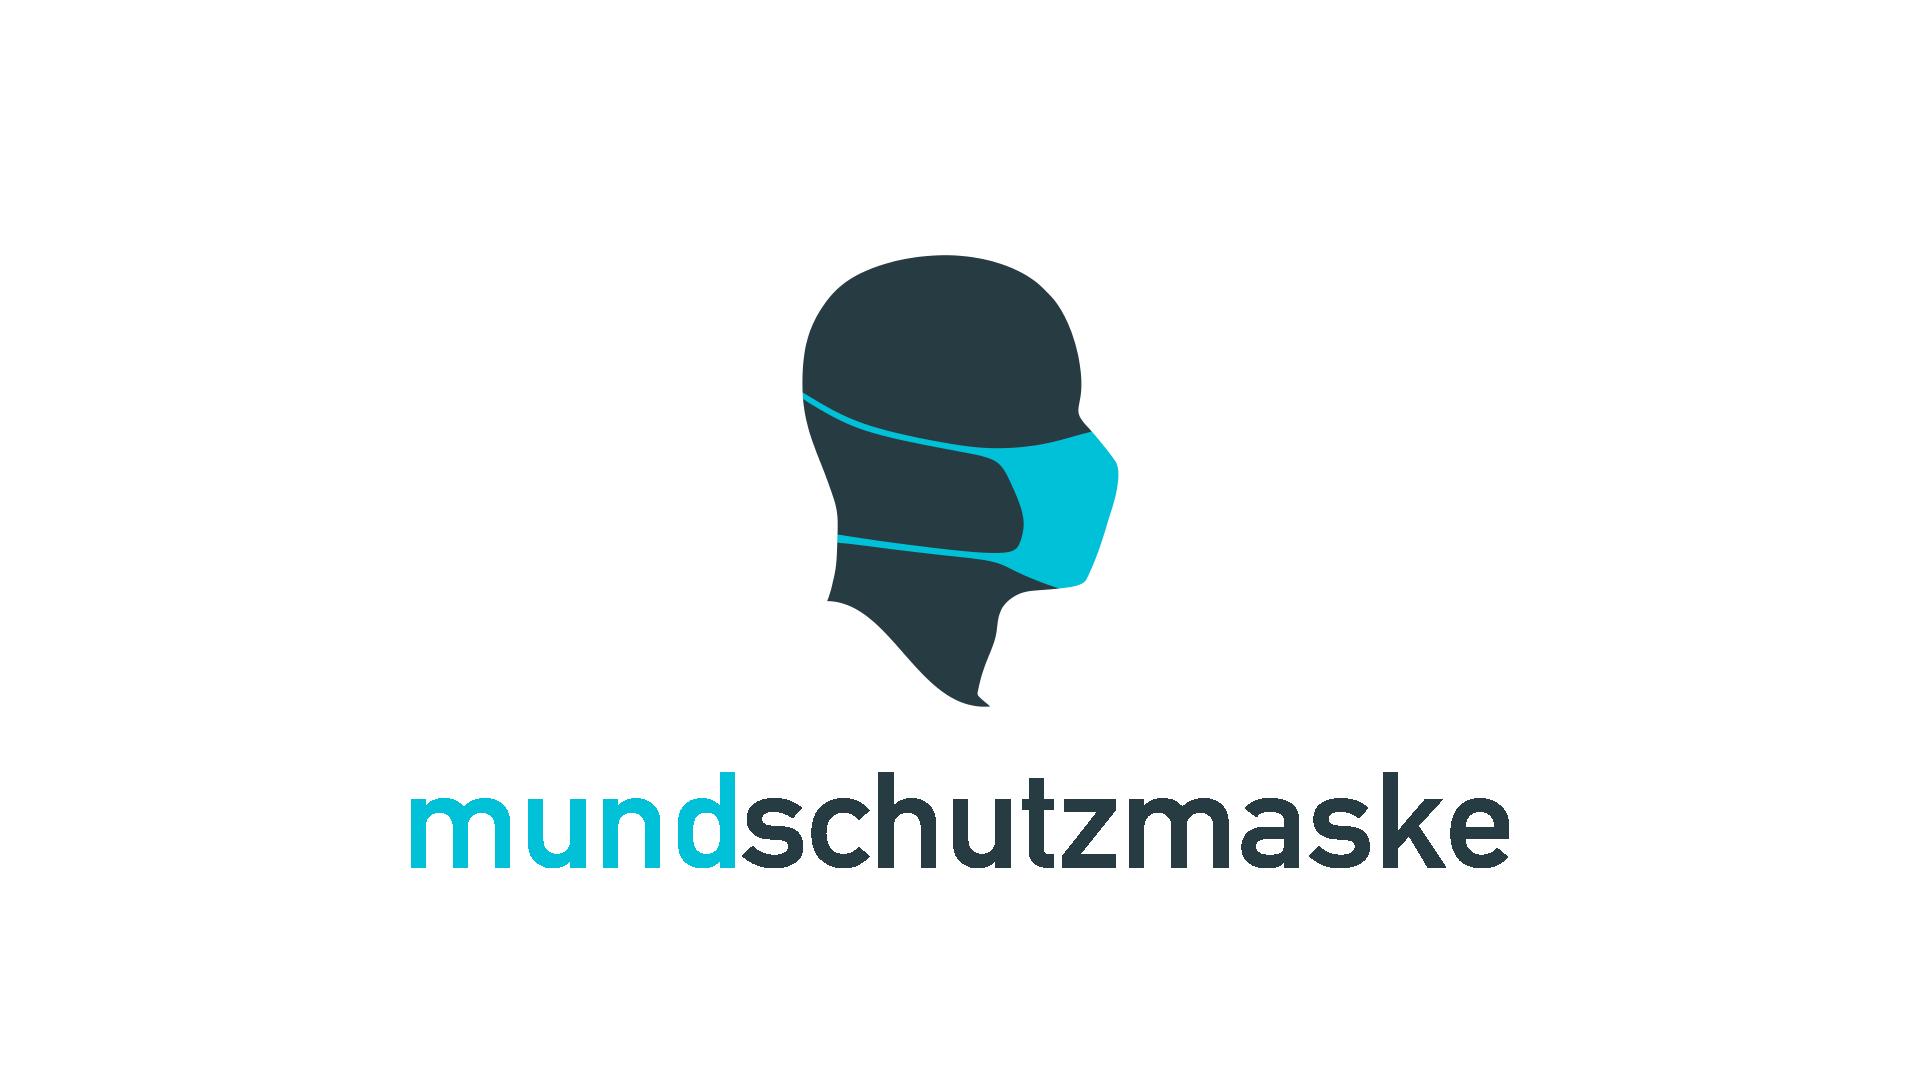 Mundschutzmaske.de